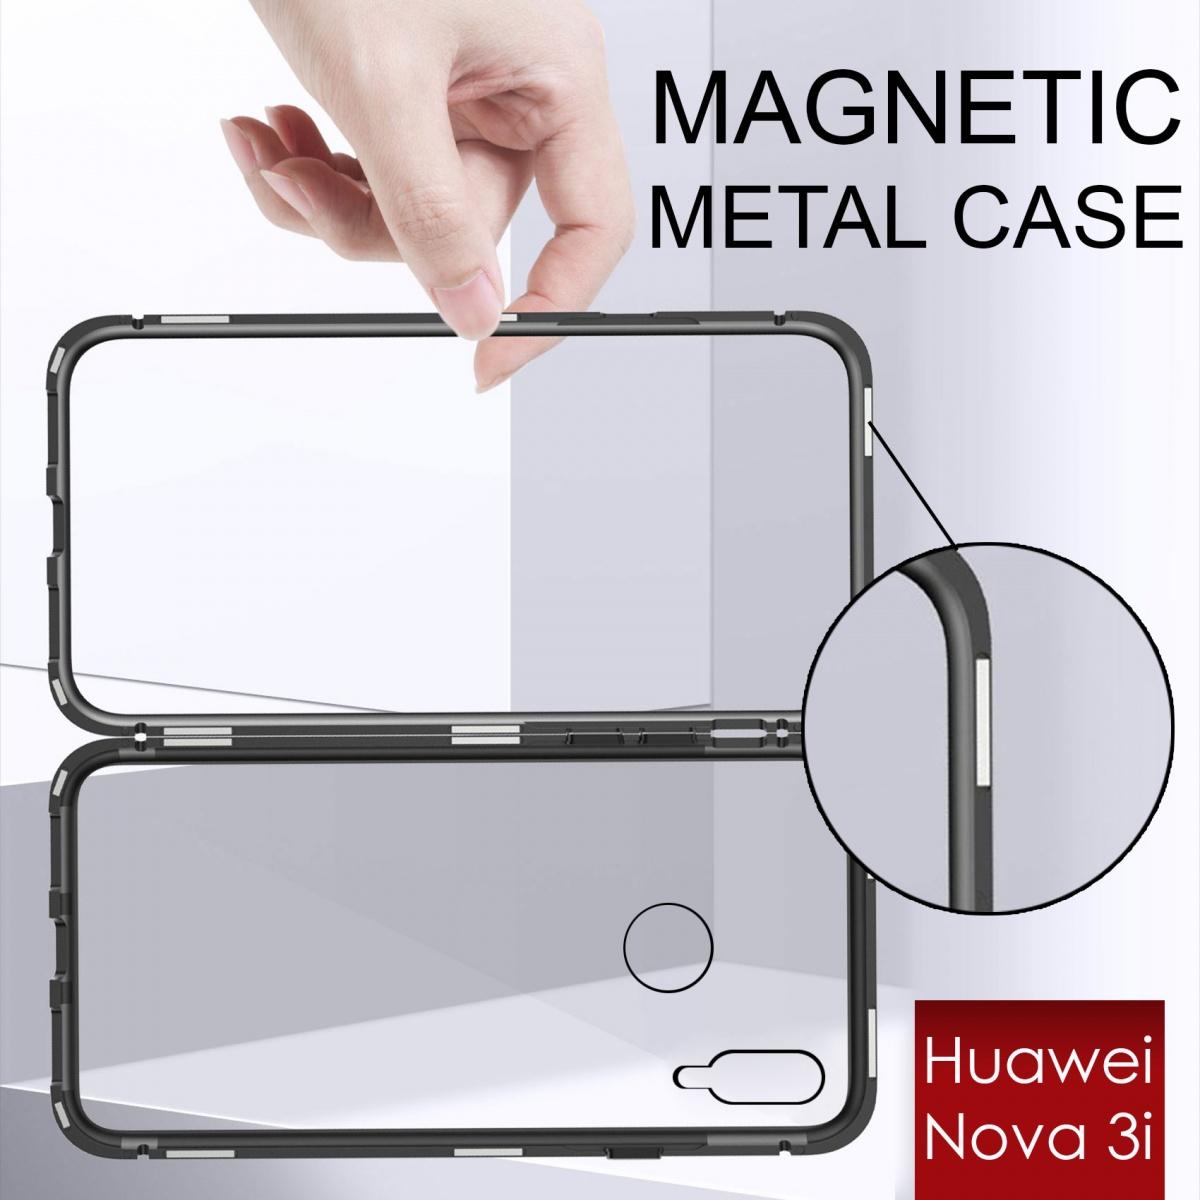 Huawei Nova 3i Magnetic Metal Flip Phone Case - Black